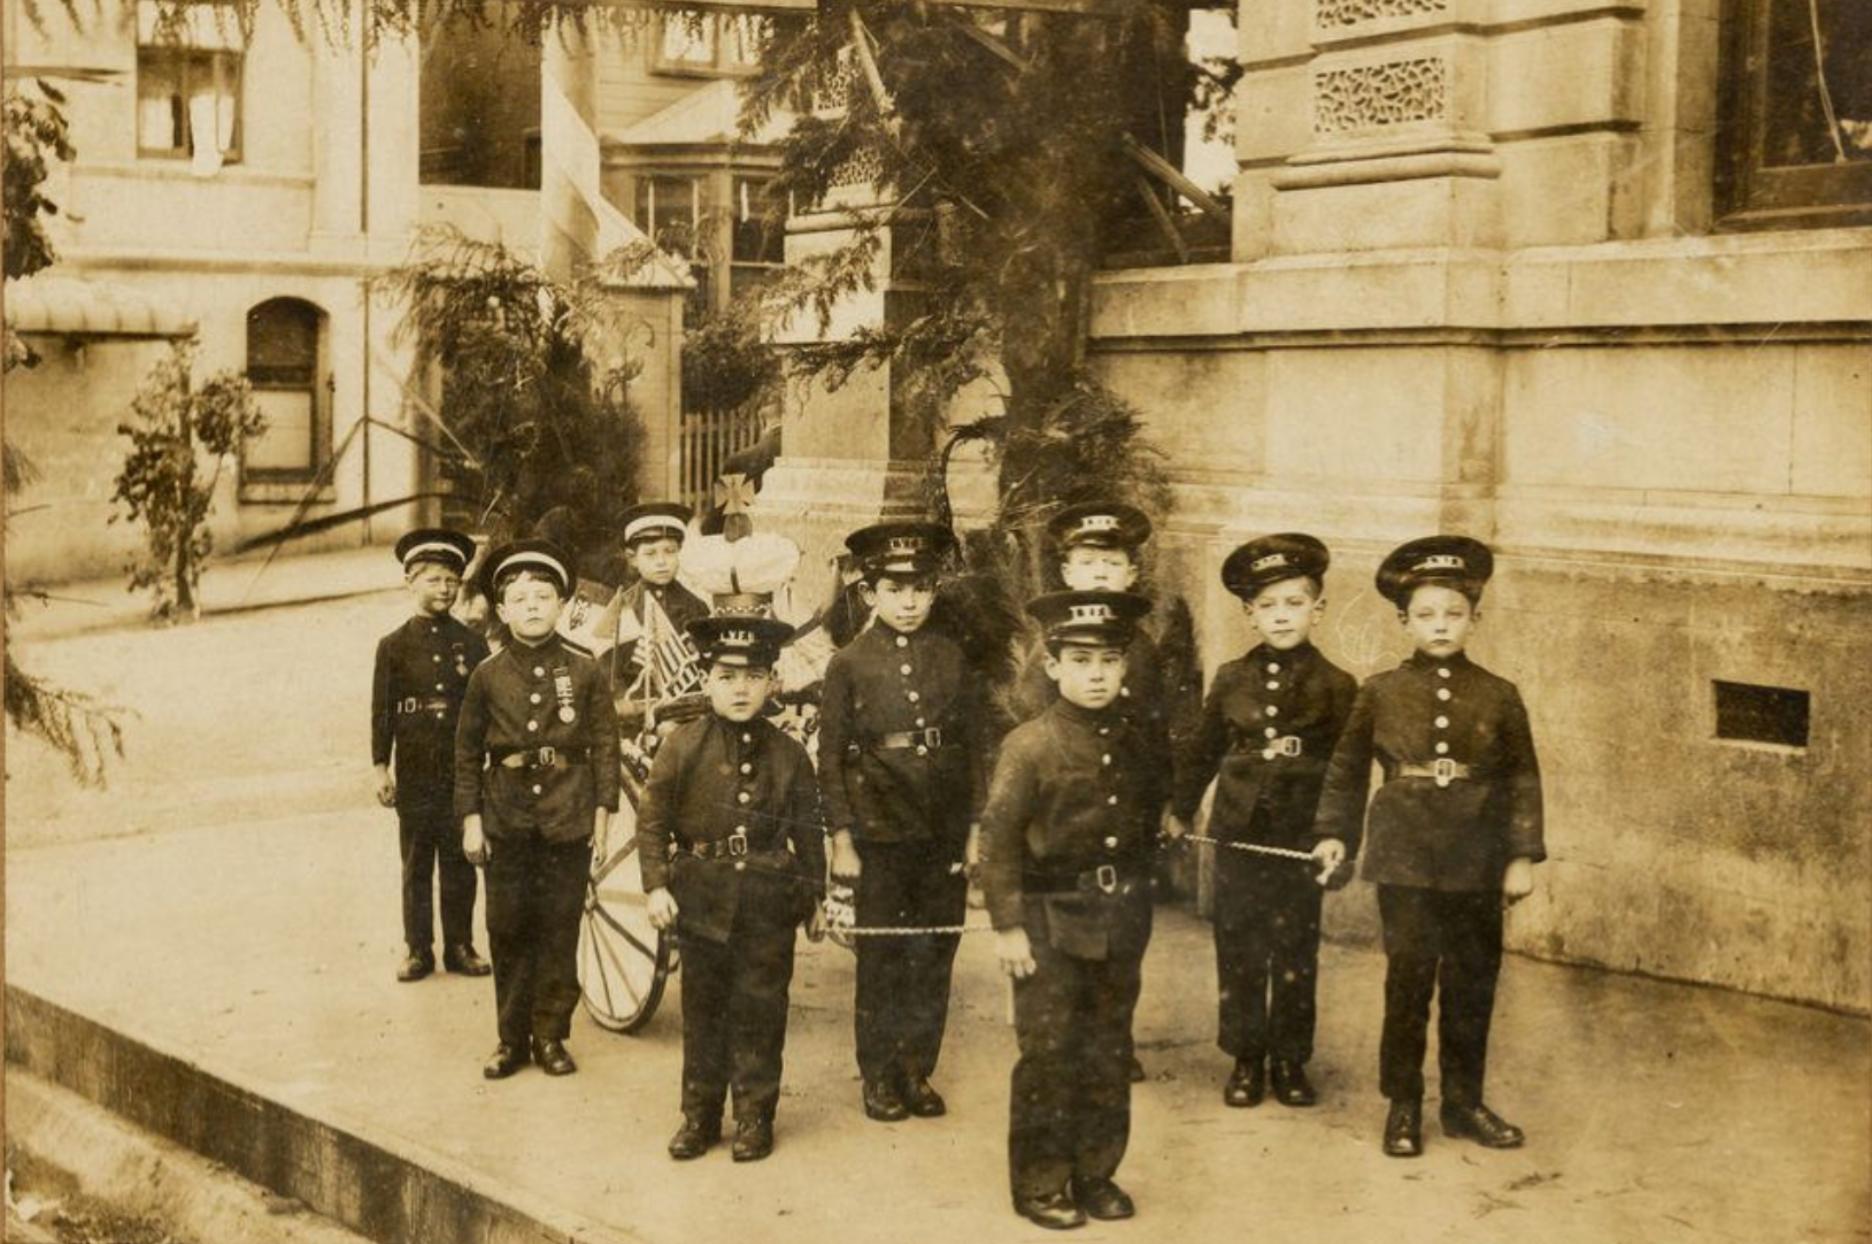 Nine young boys dressed in Lyttelton Volunteer Fire Brigade uniforms - 14978.1